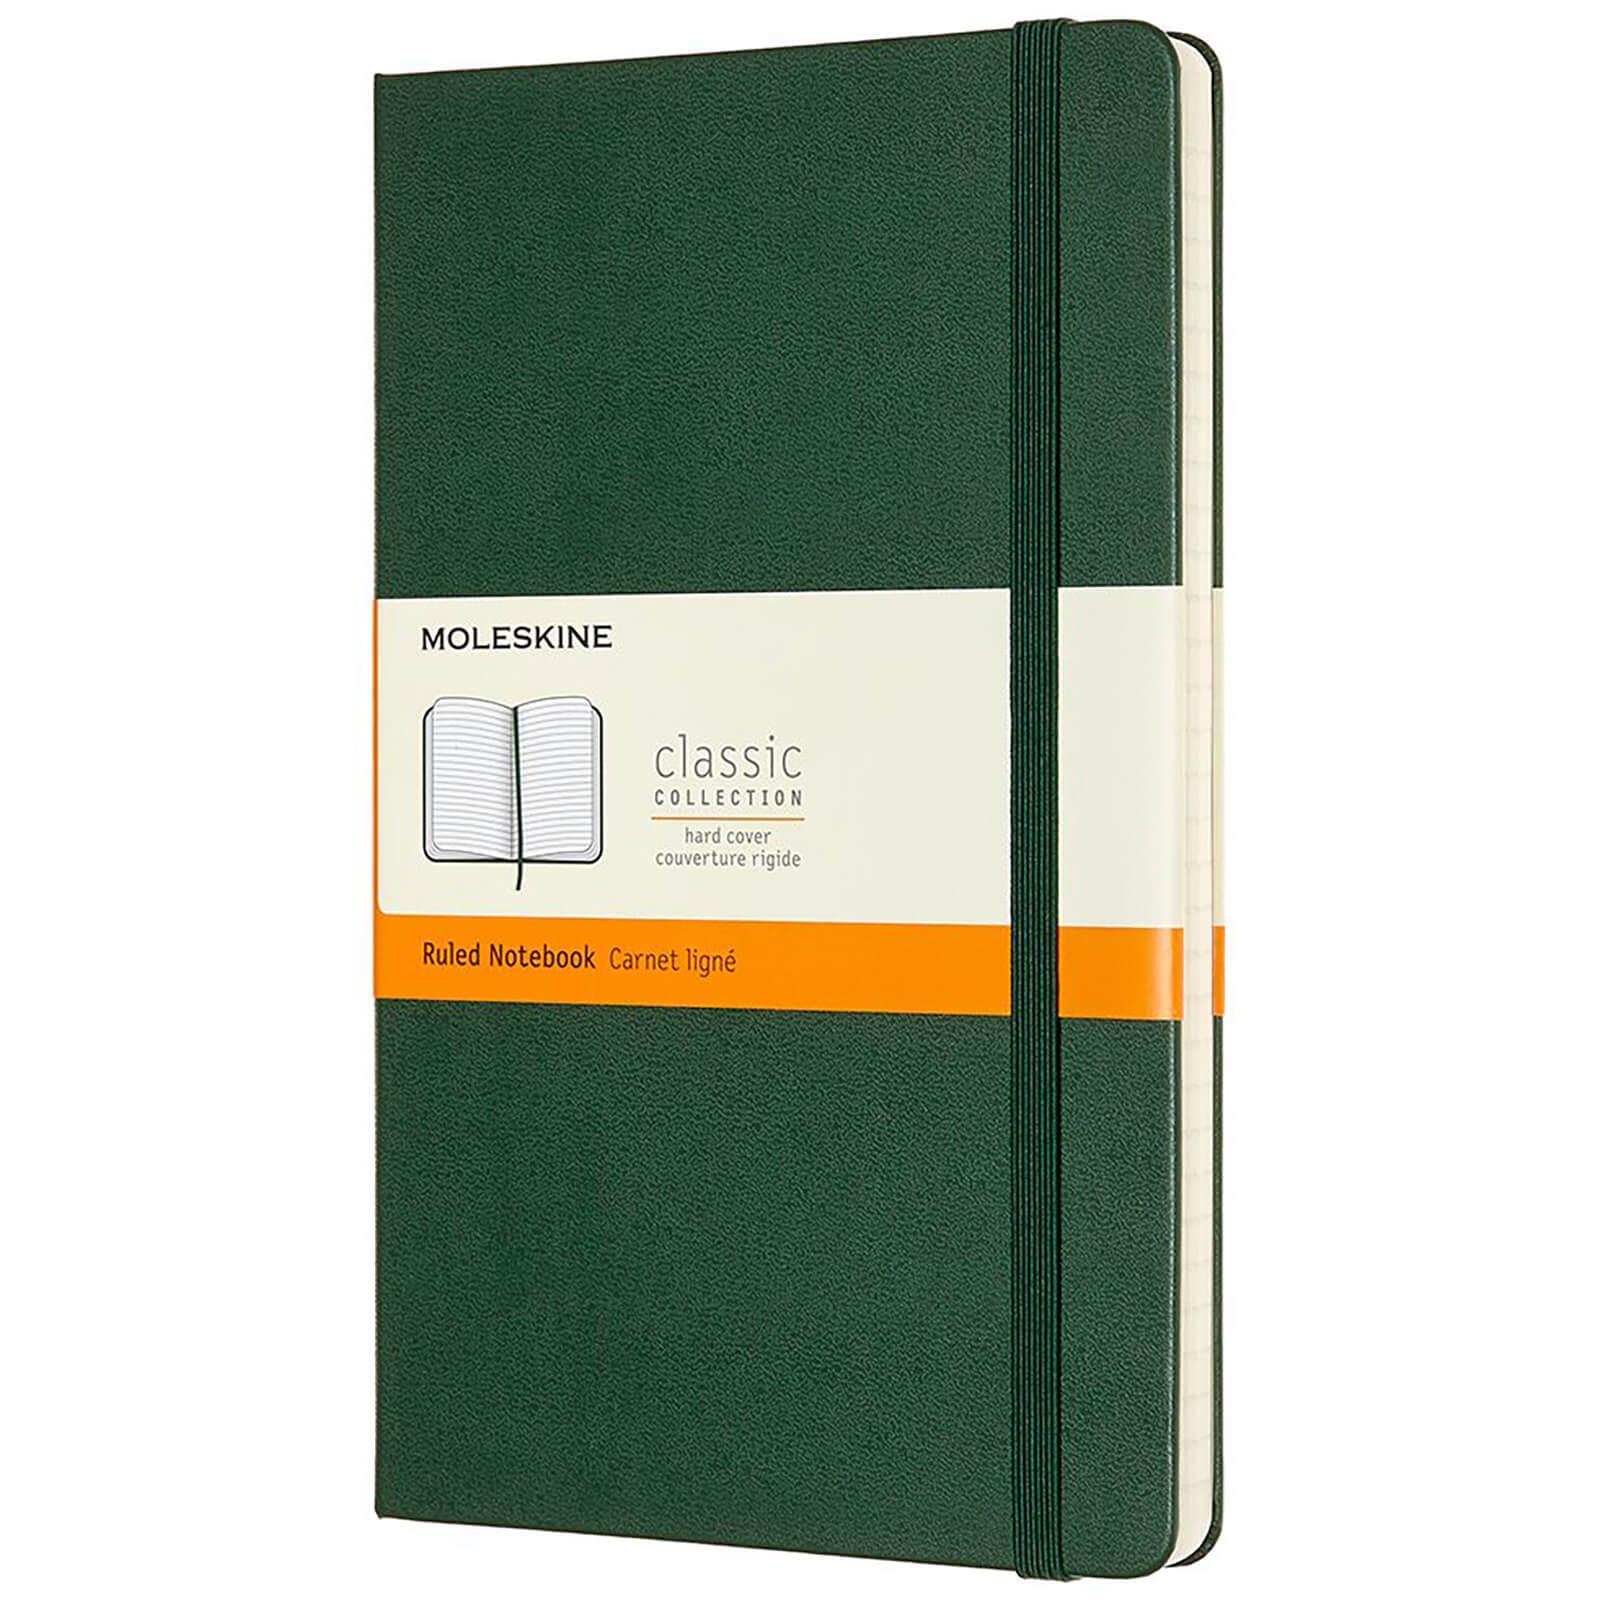 Moleskine Classic Ruled Hardcover Large Notebook - Myrtle Green